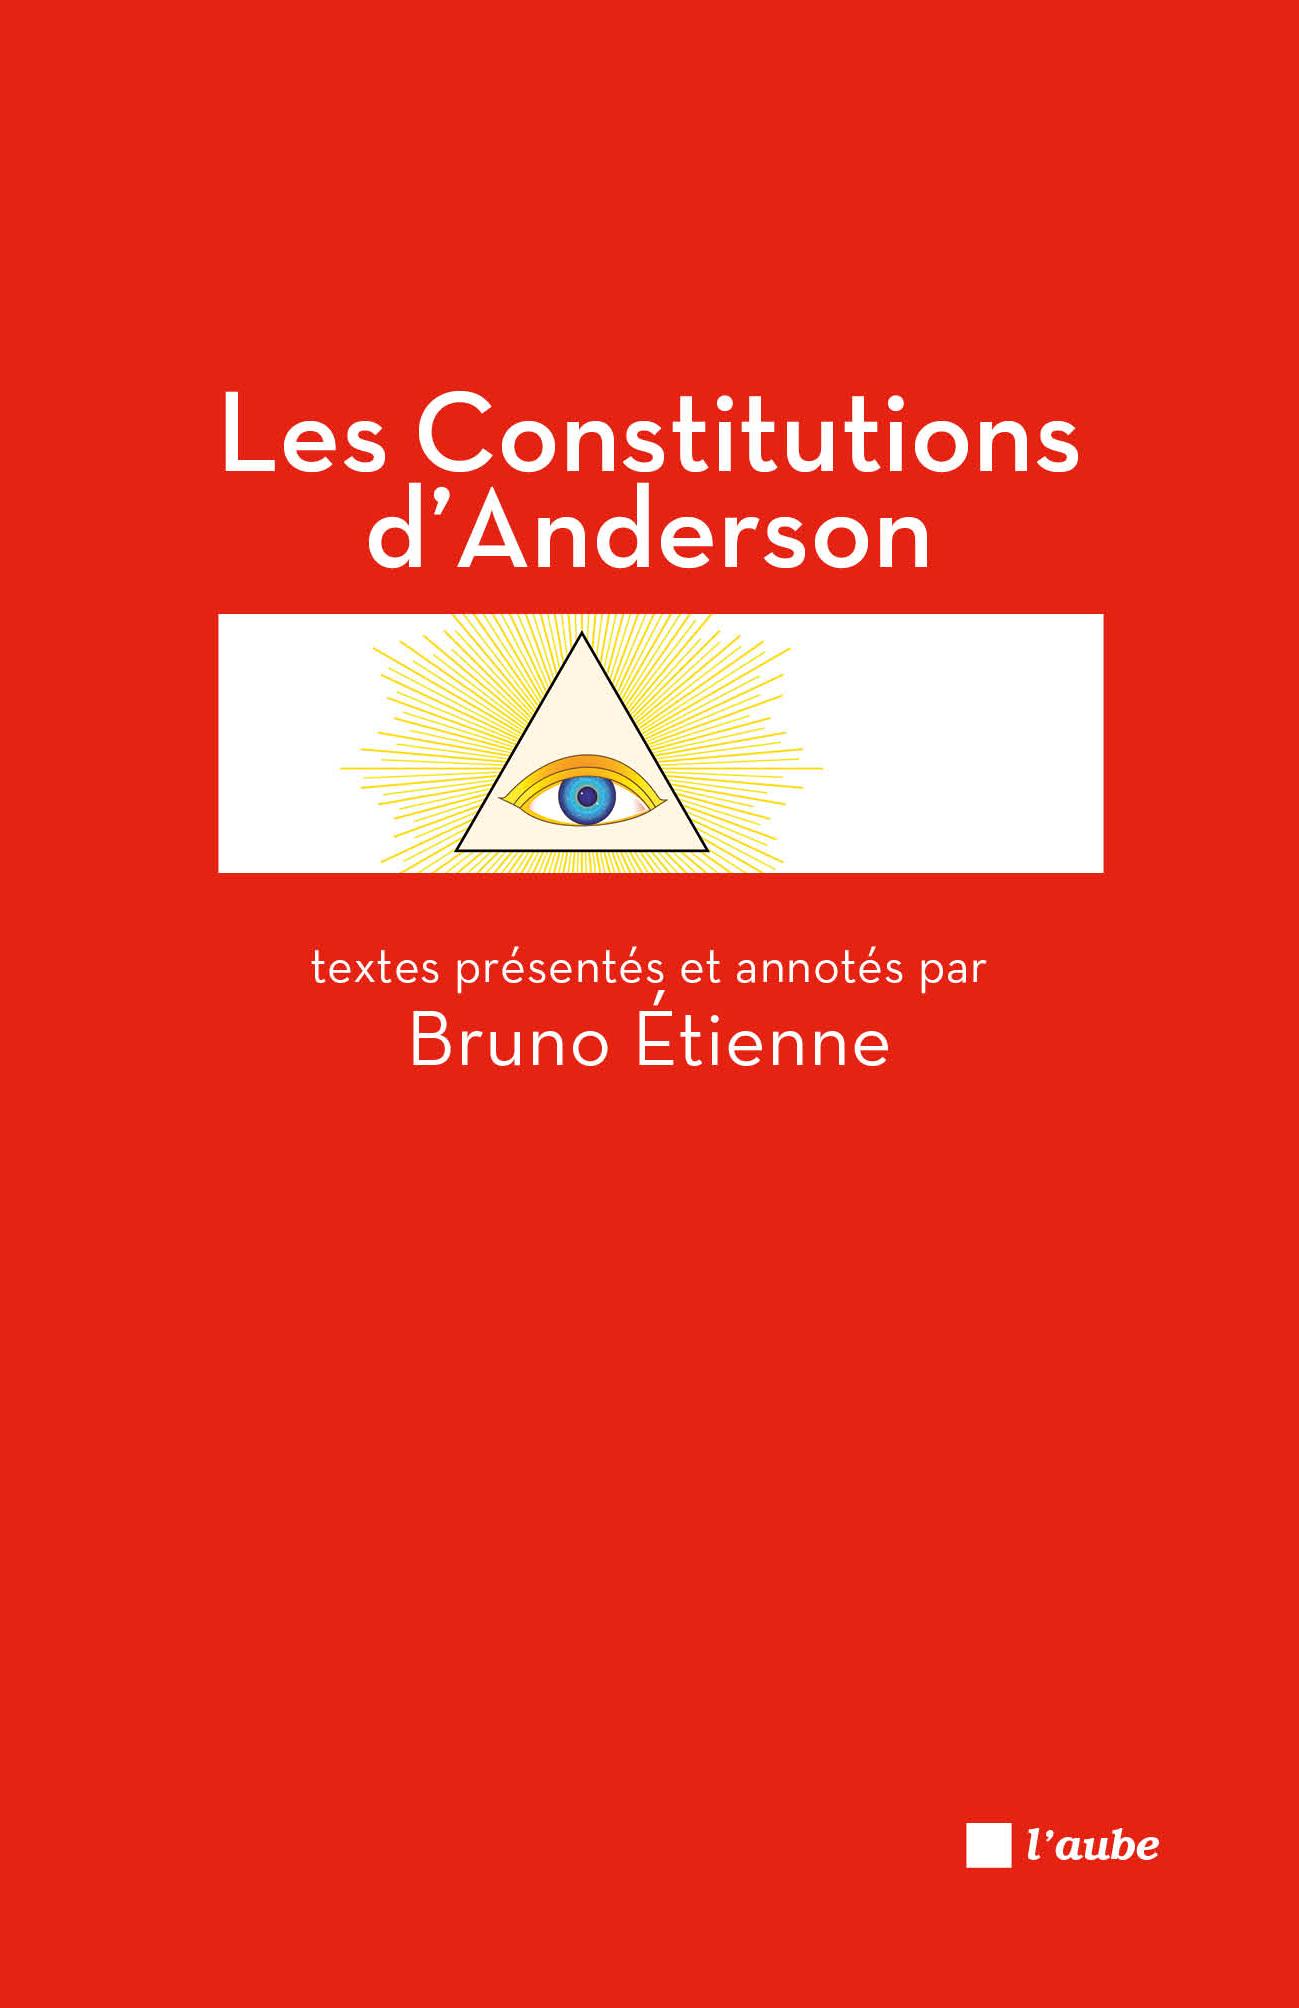 Les Constitutions d'Anderson